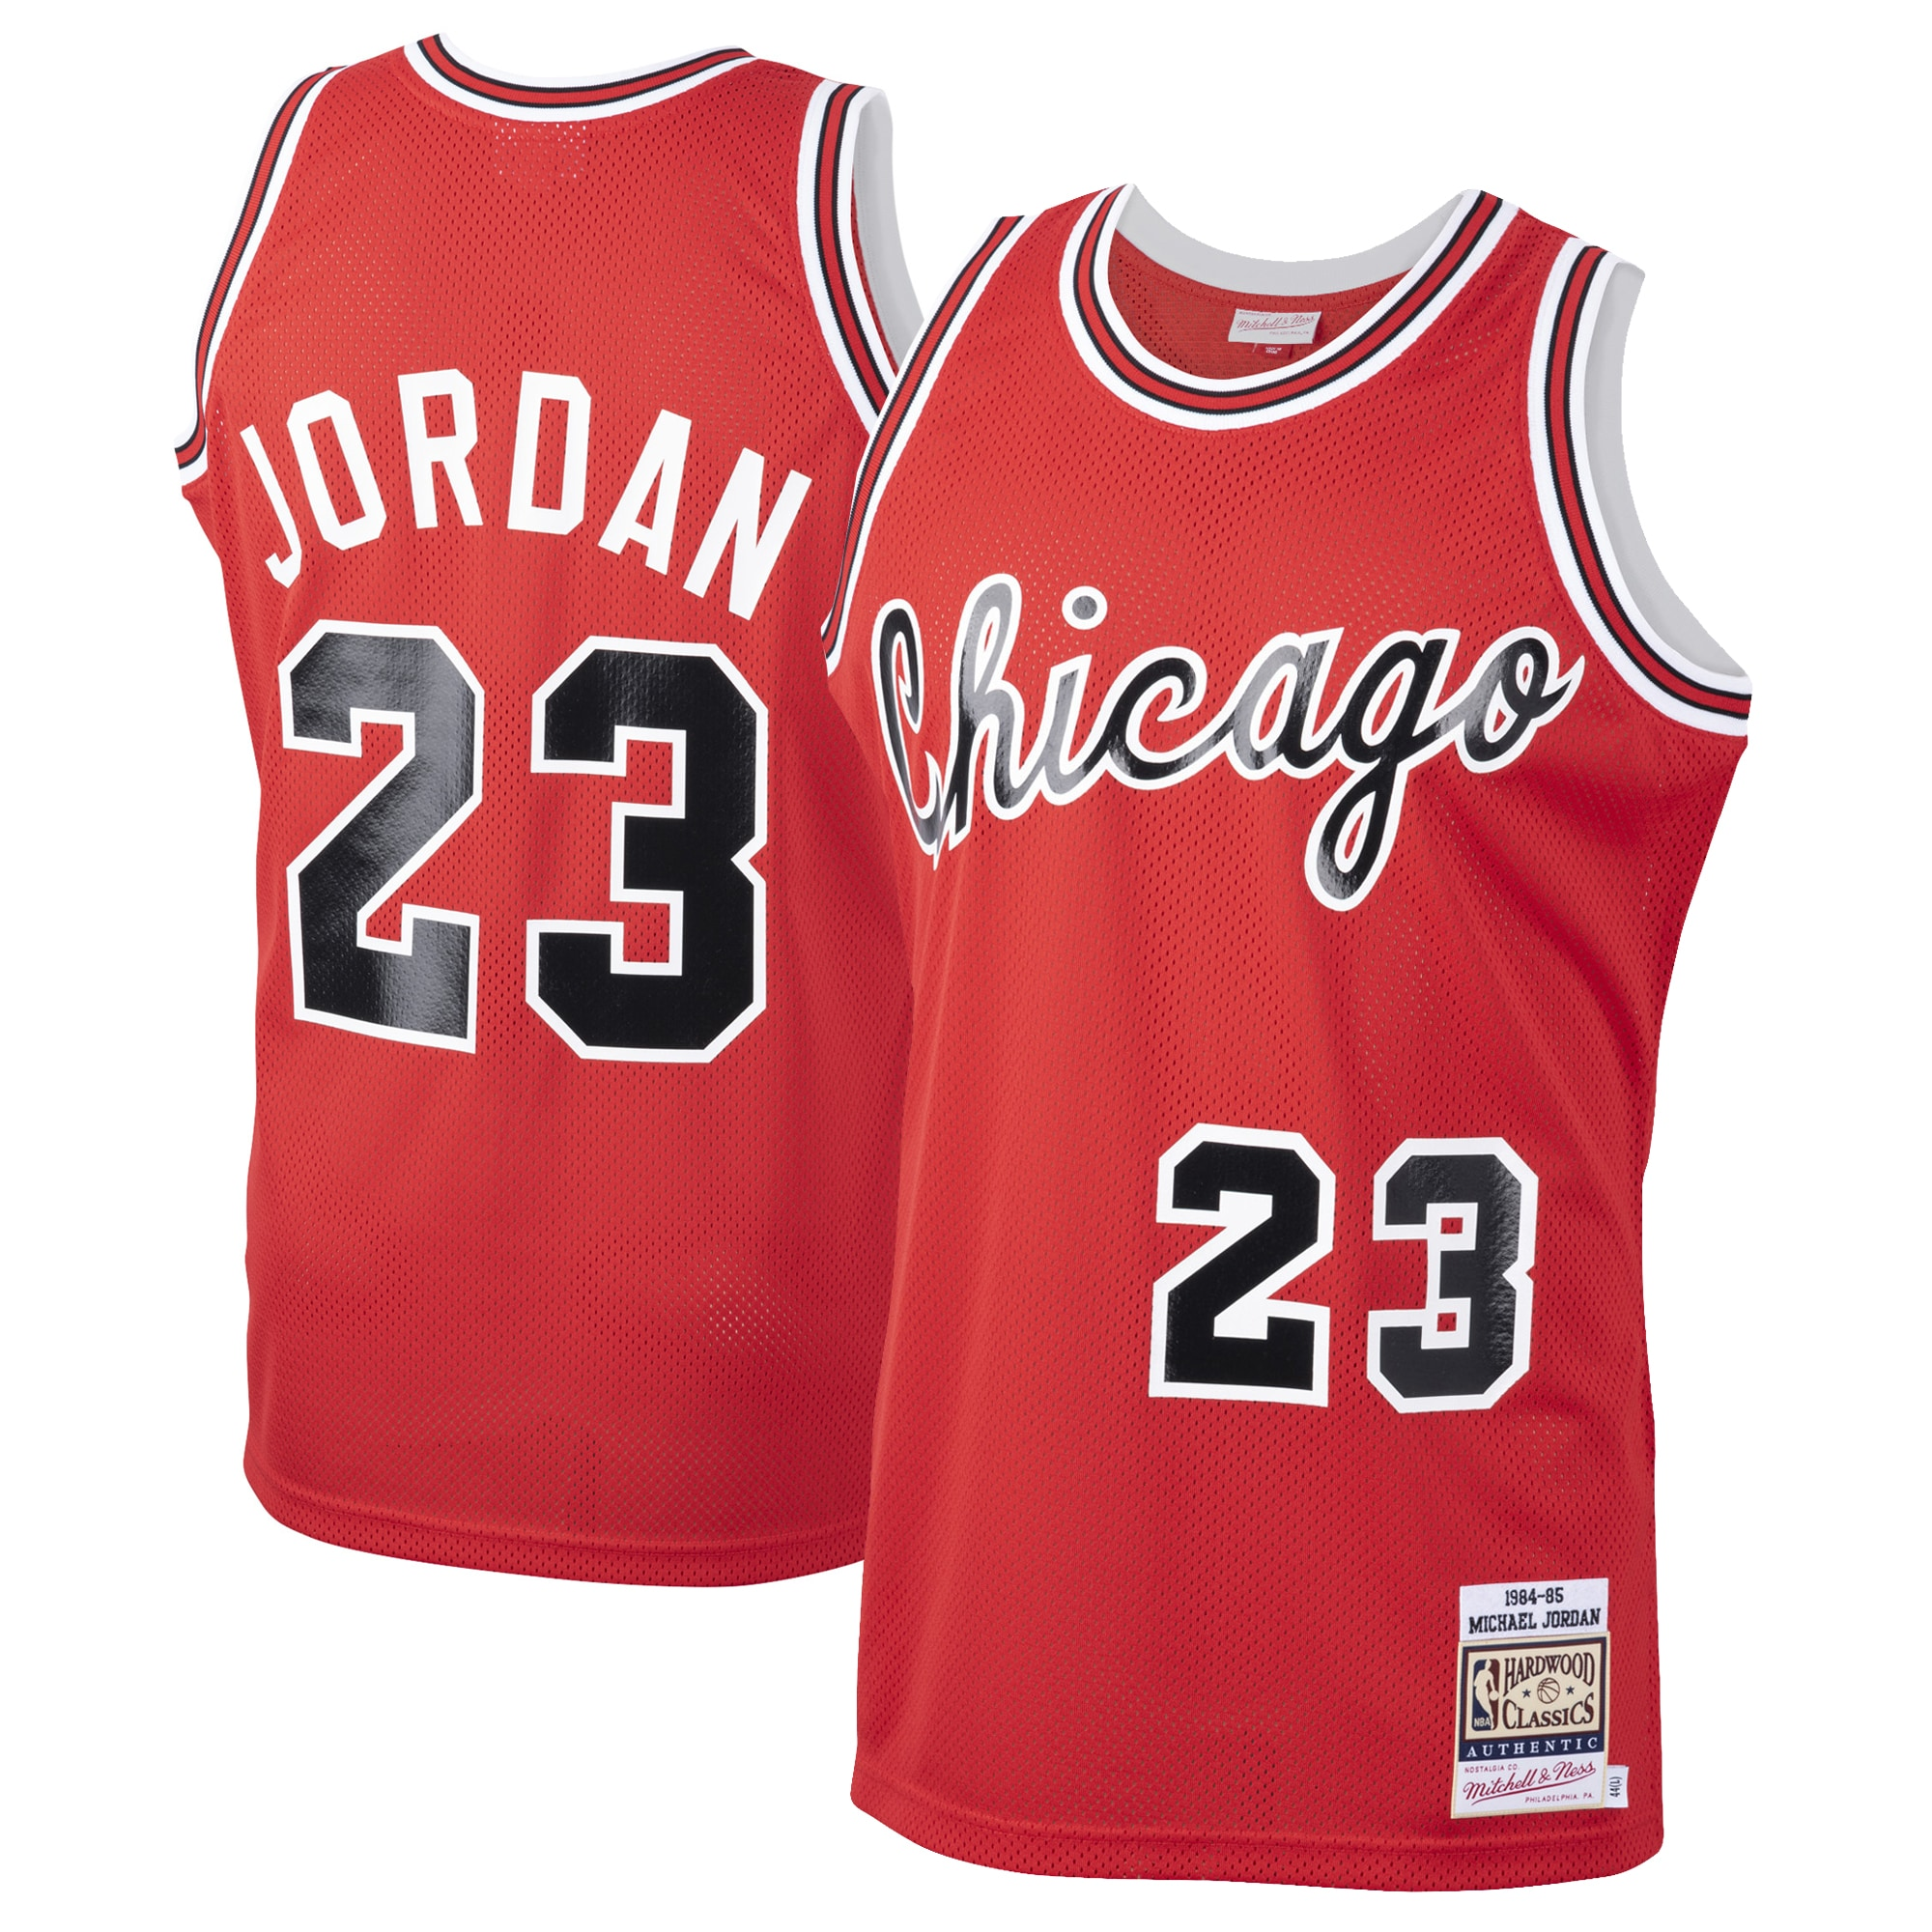 Michael Jordan Chicago Bulls Mitchell & Ness 1984-85 Hardwood Classics Rookie Authentic Jersey - Red